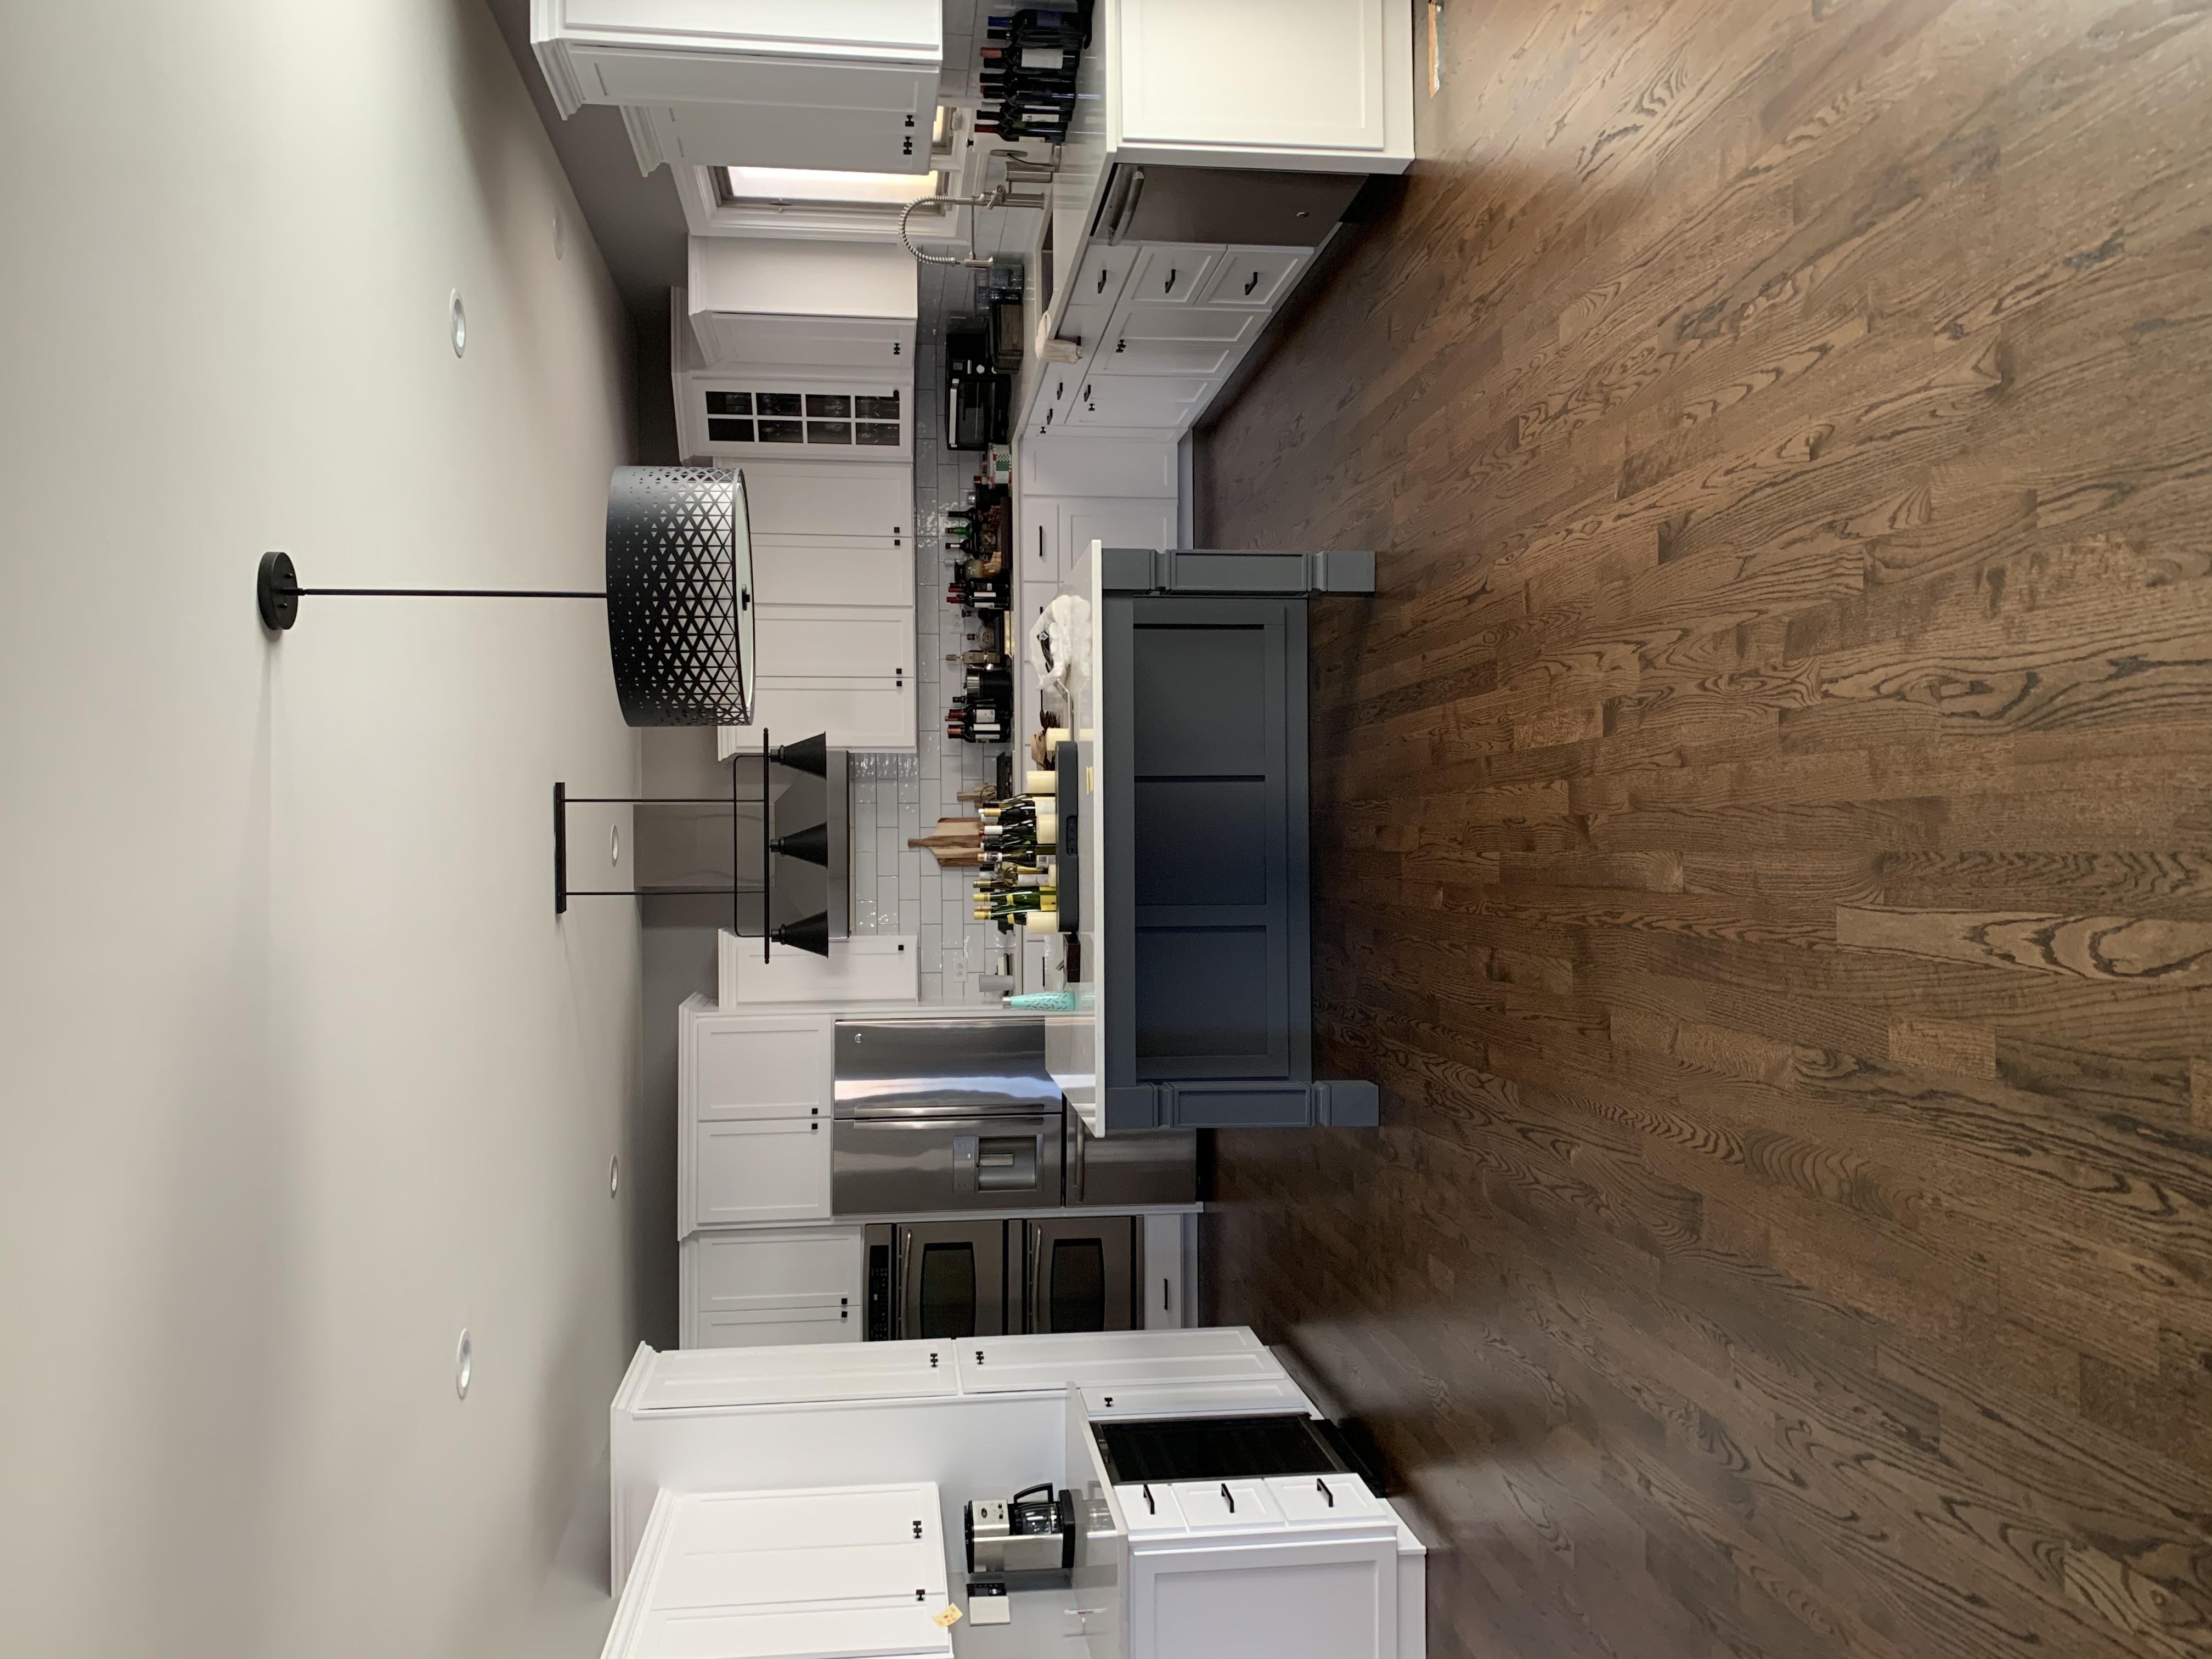 Hardwood Flooring Sales/Installation/Refinishing Project